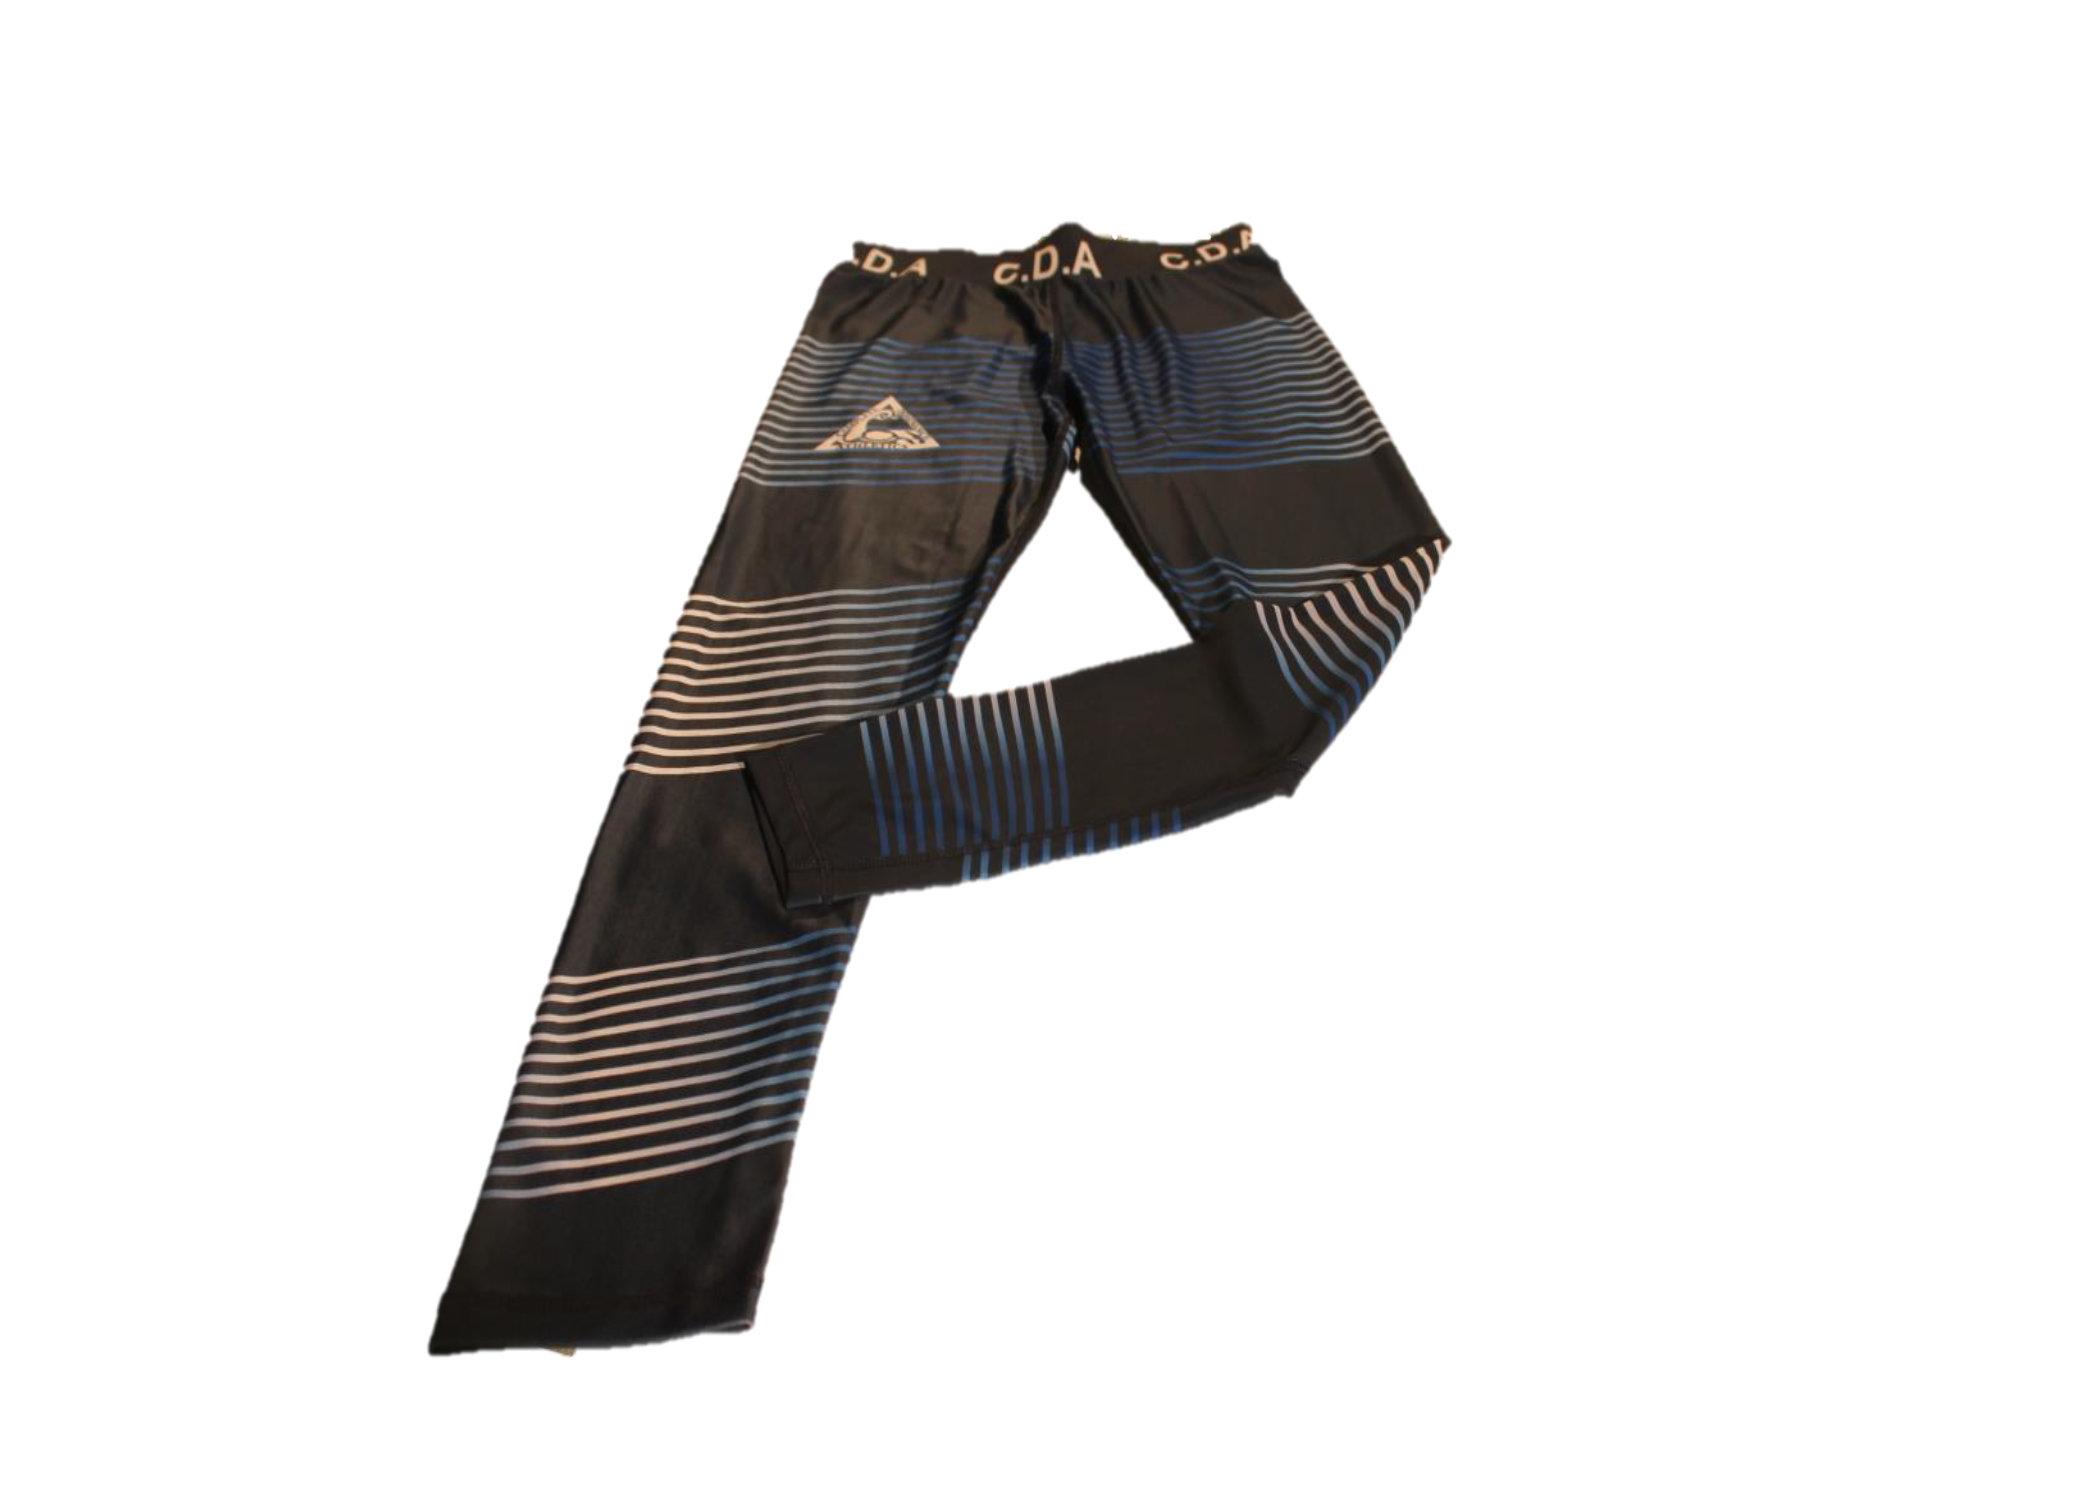 CDA Blue and white striped leggings